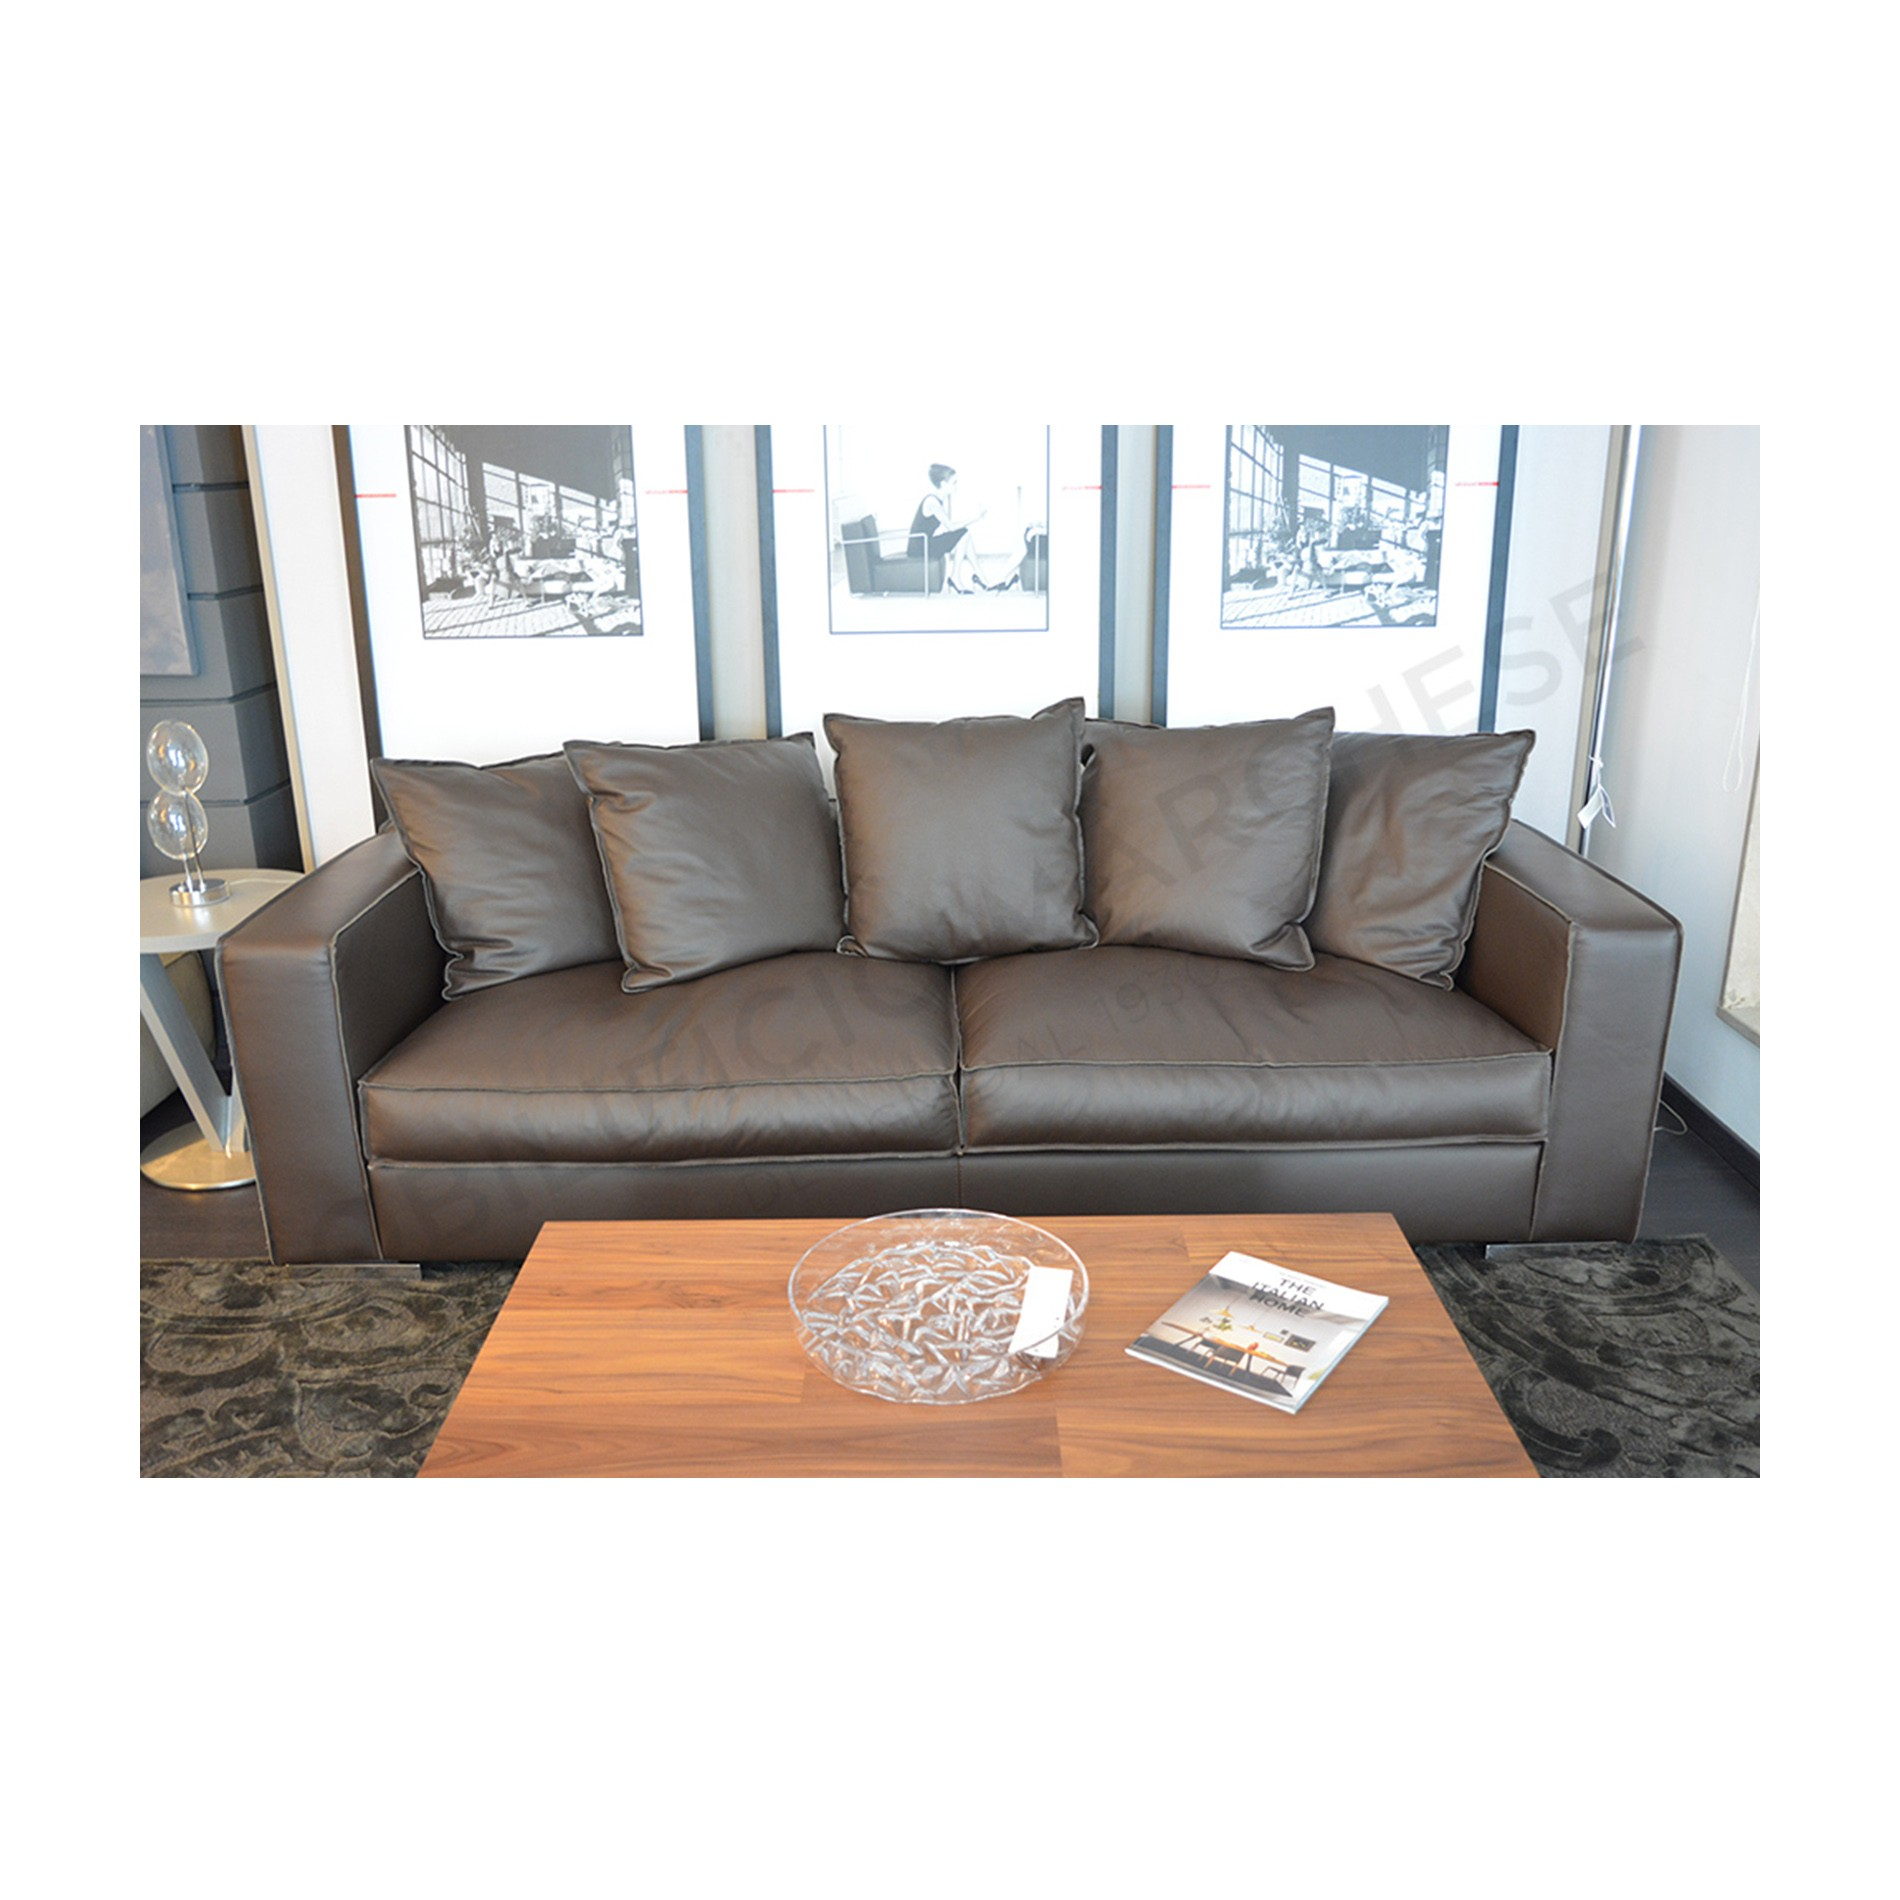 Echo sofa by Epoque Mobilificio Marchese